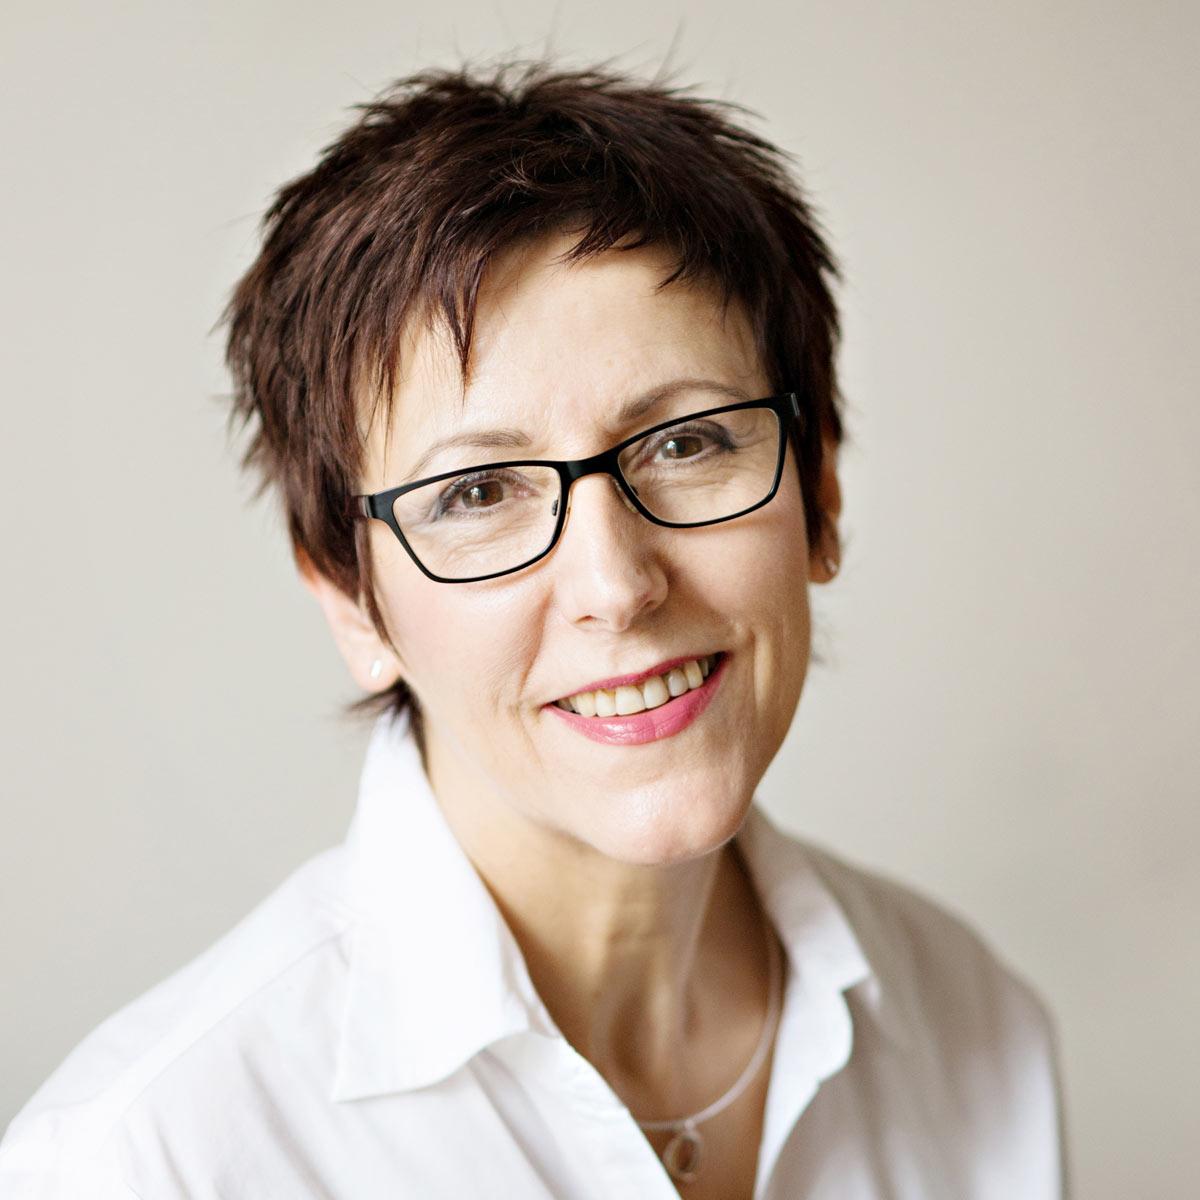 Judy Merrick